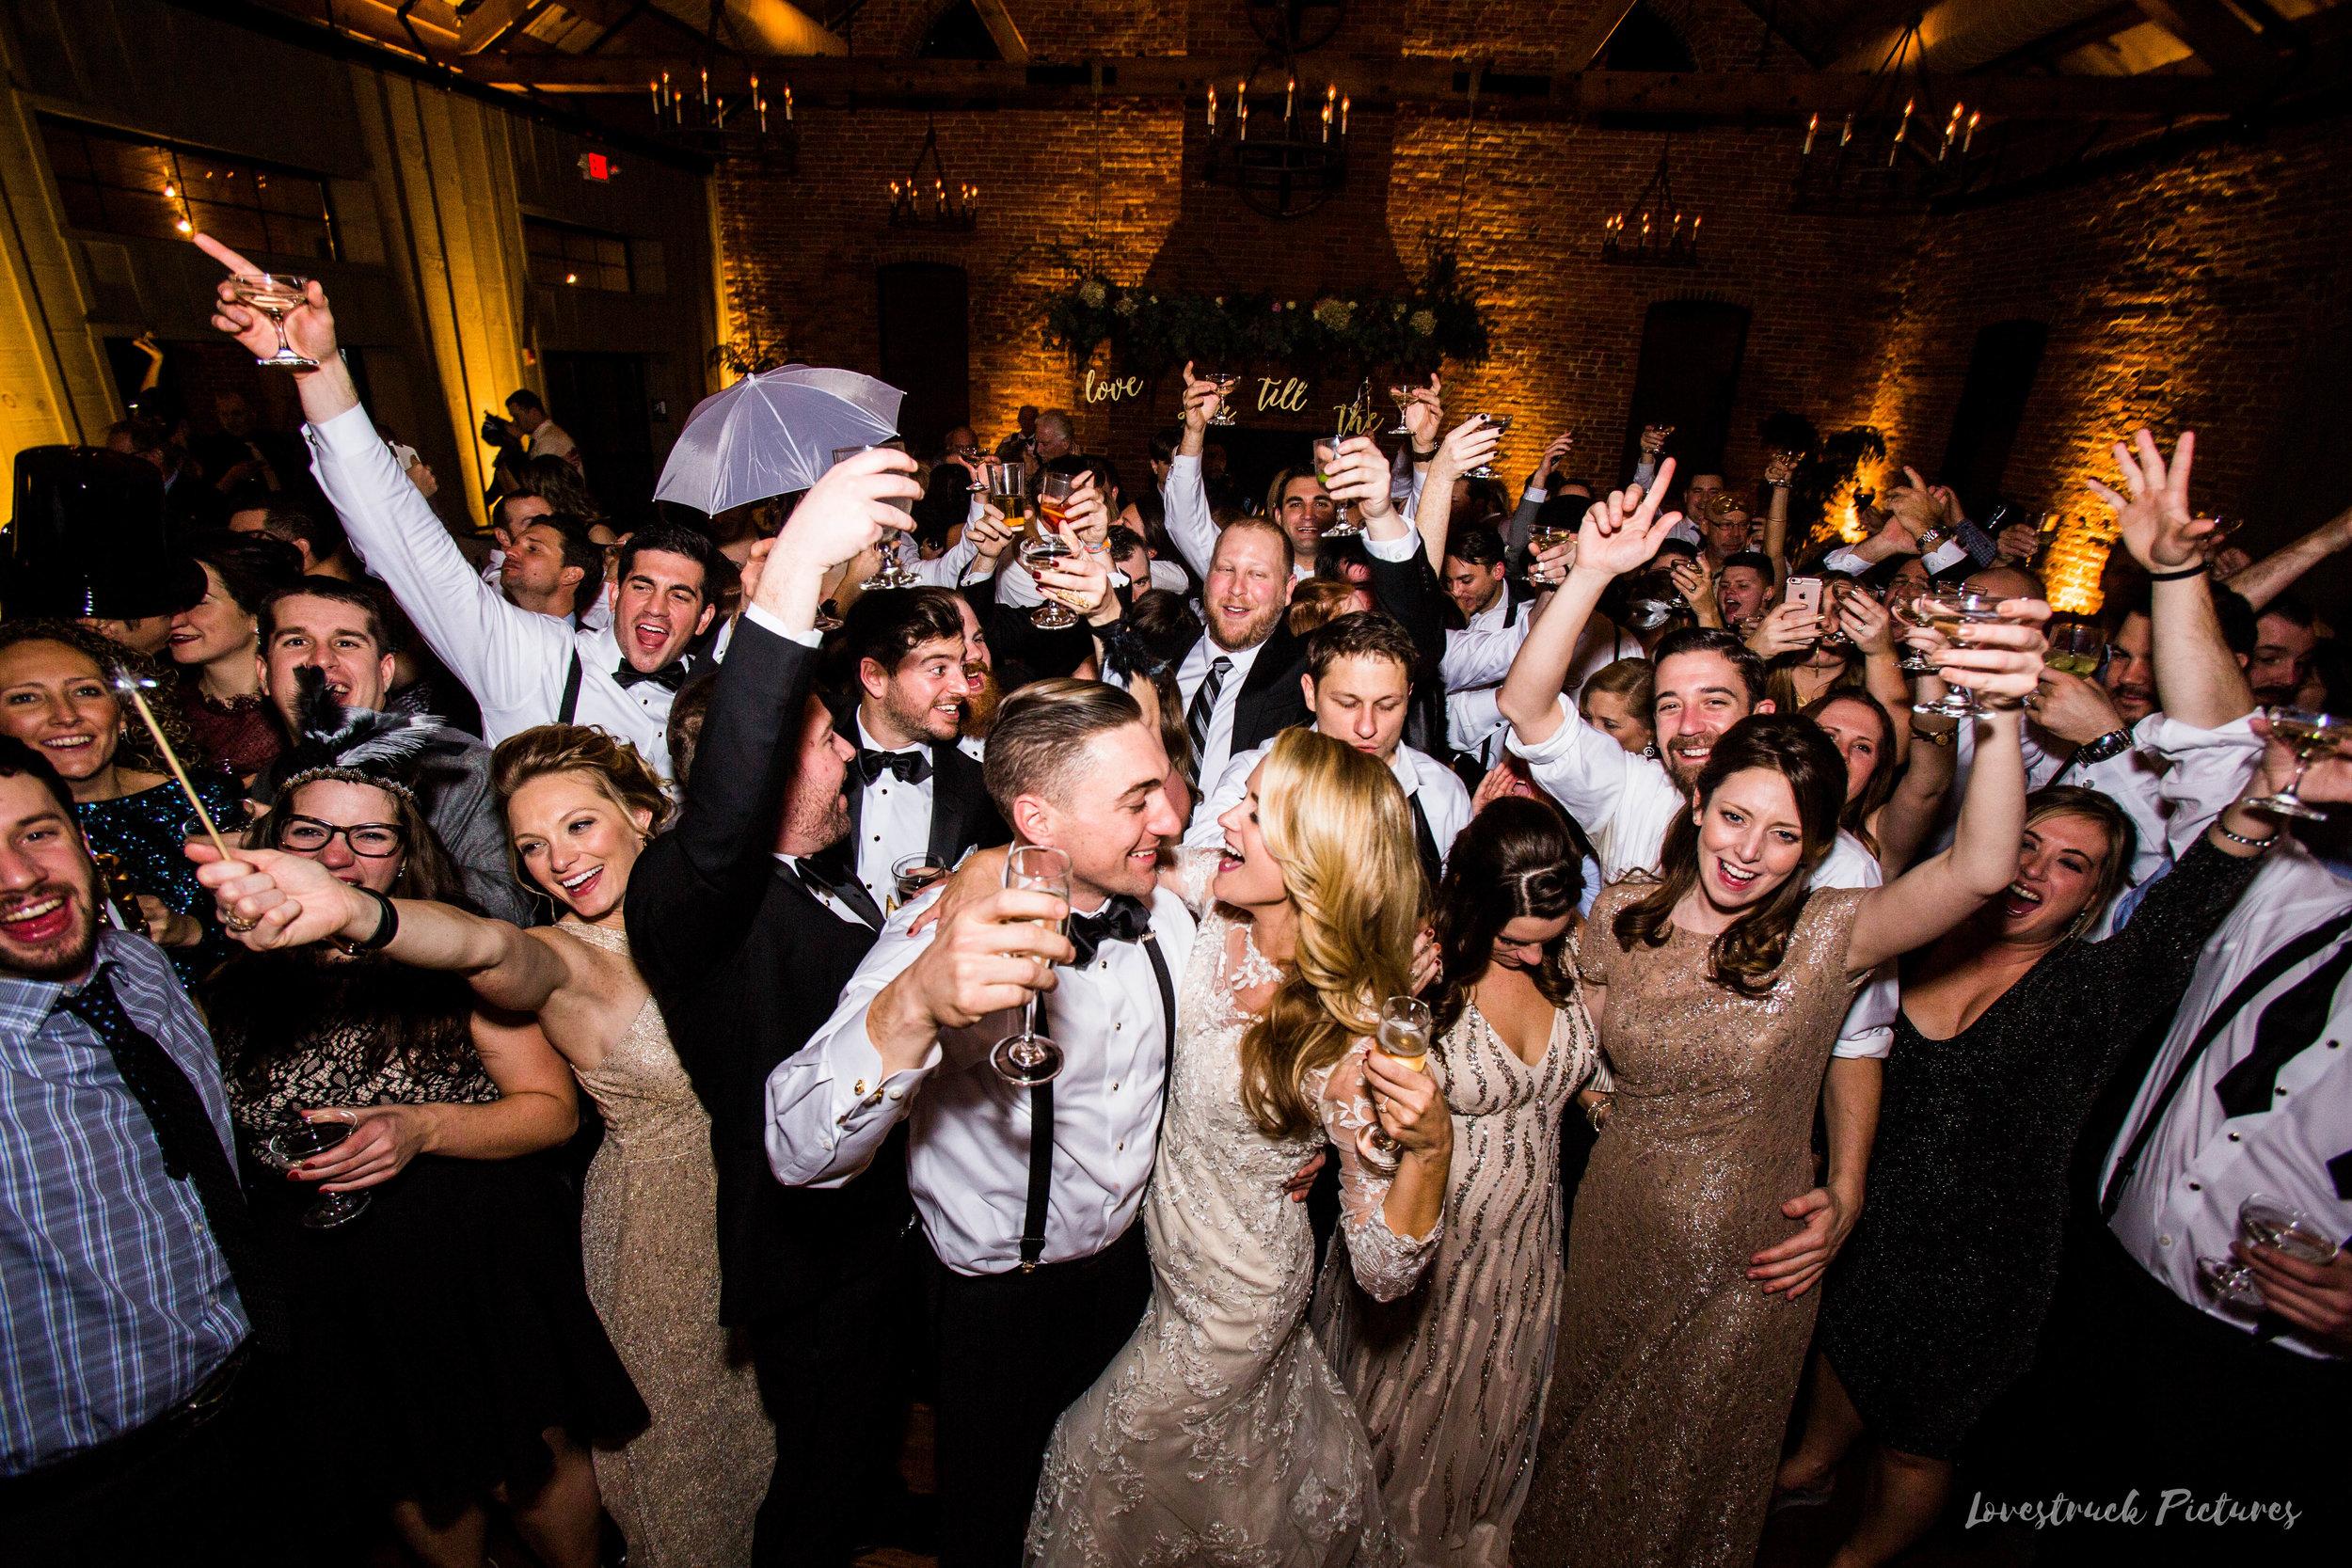 CORK_FACTORY_WEDDING_LANCASTER--345.jpg